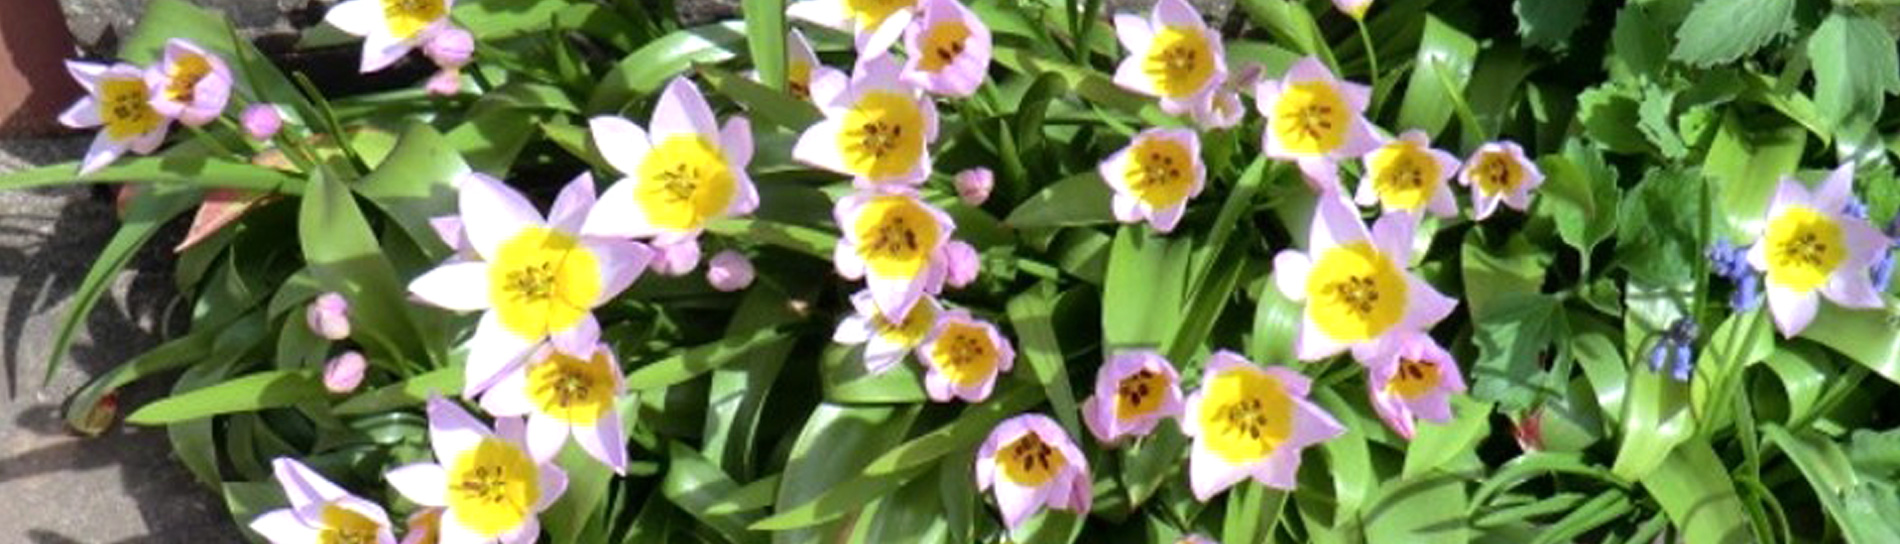 John-Horsey-Horticulture-gardening-courses